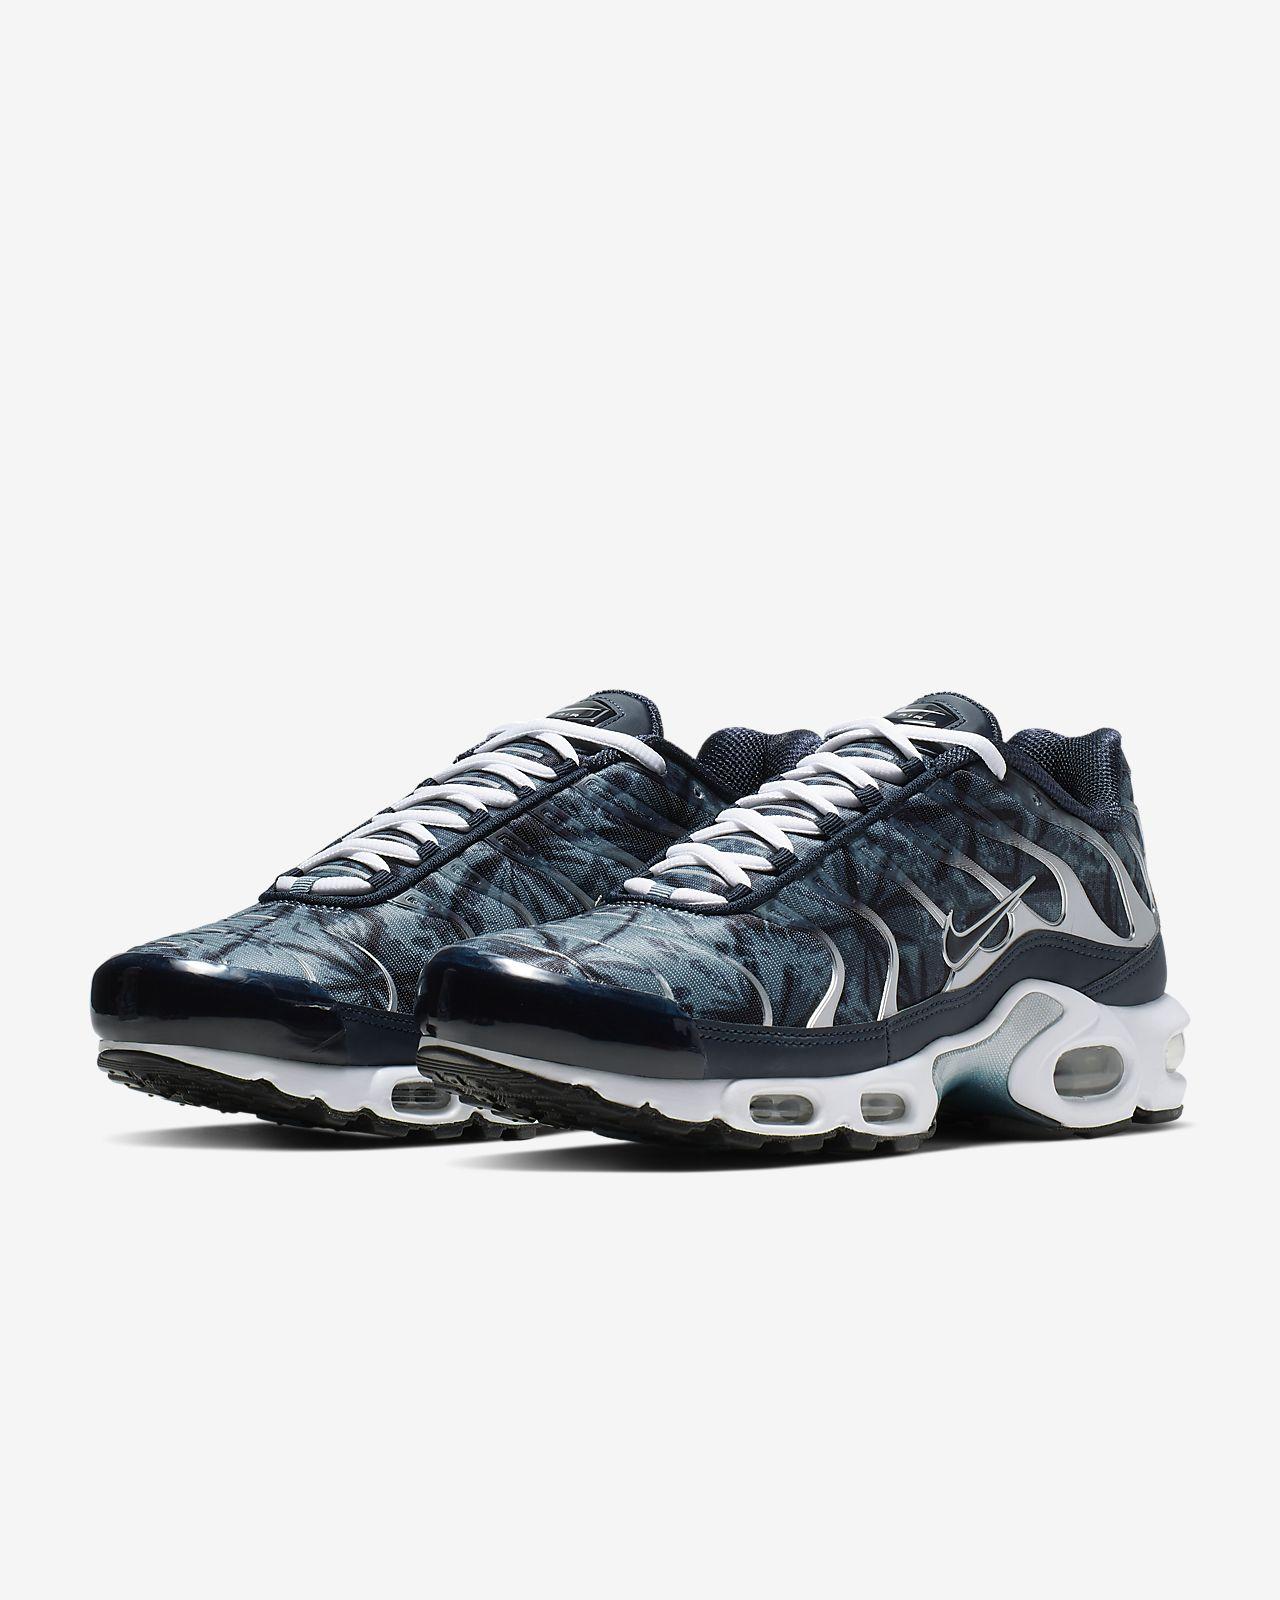 Og Chaussures Tuned Nike 1 Homme CxBerWdo